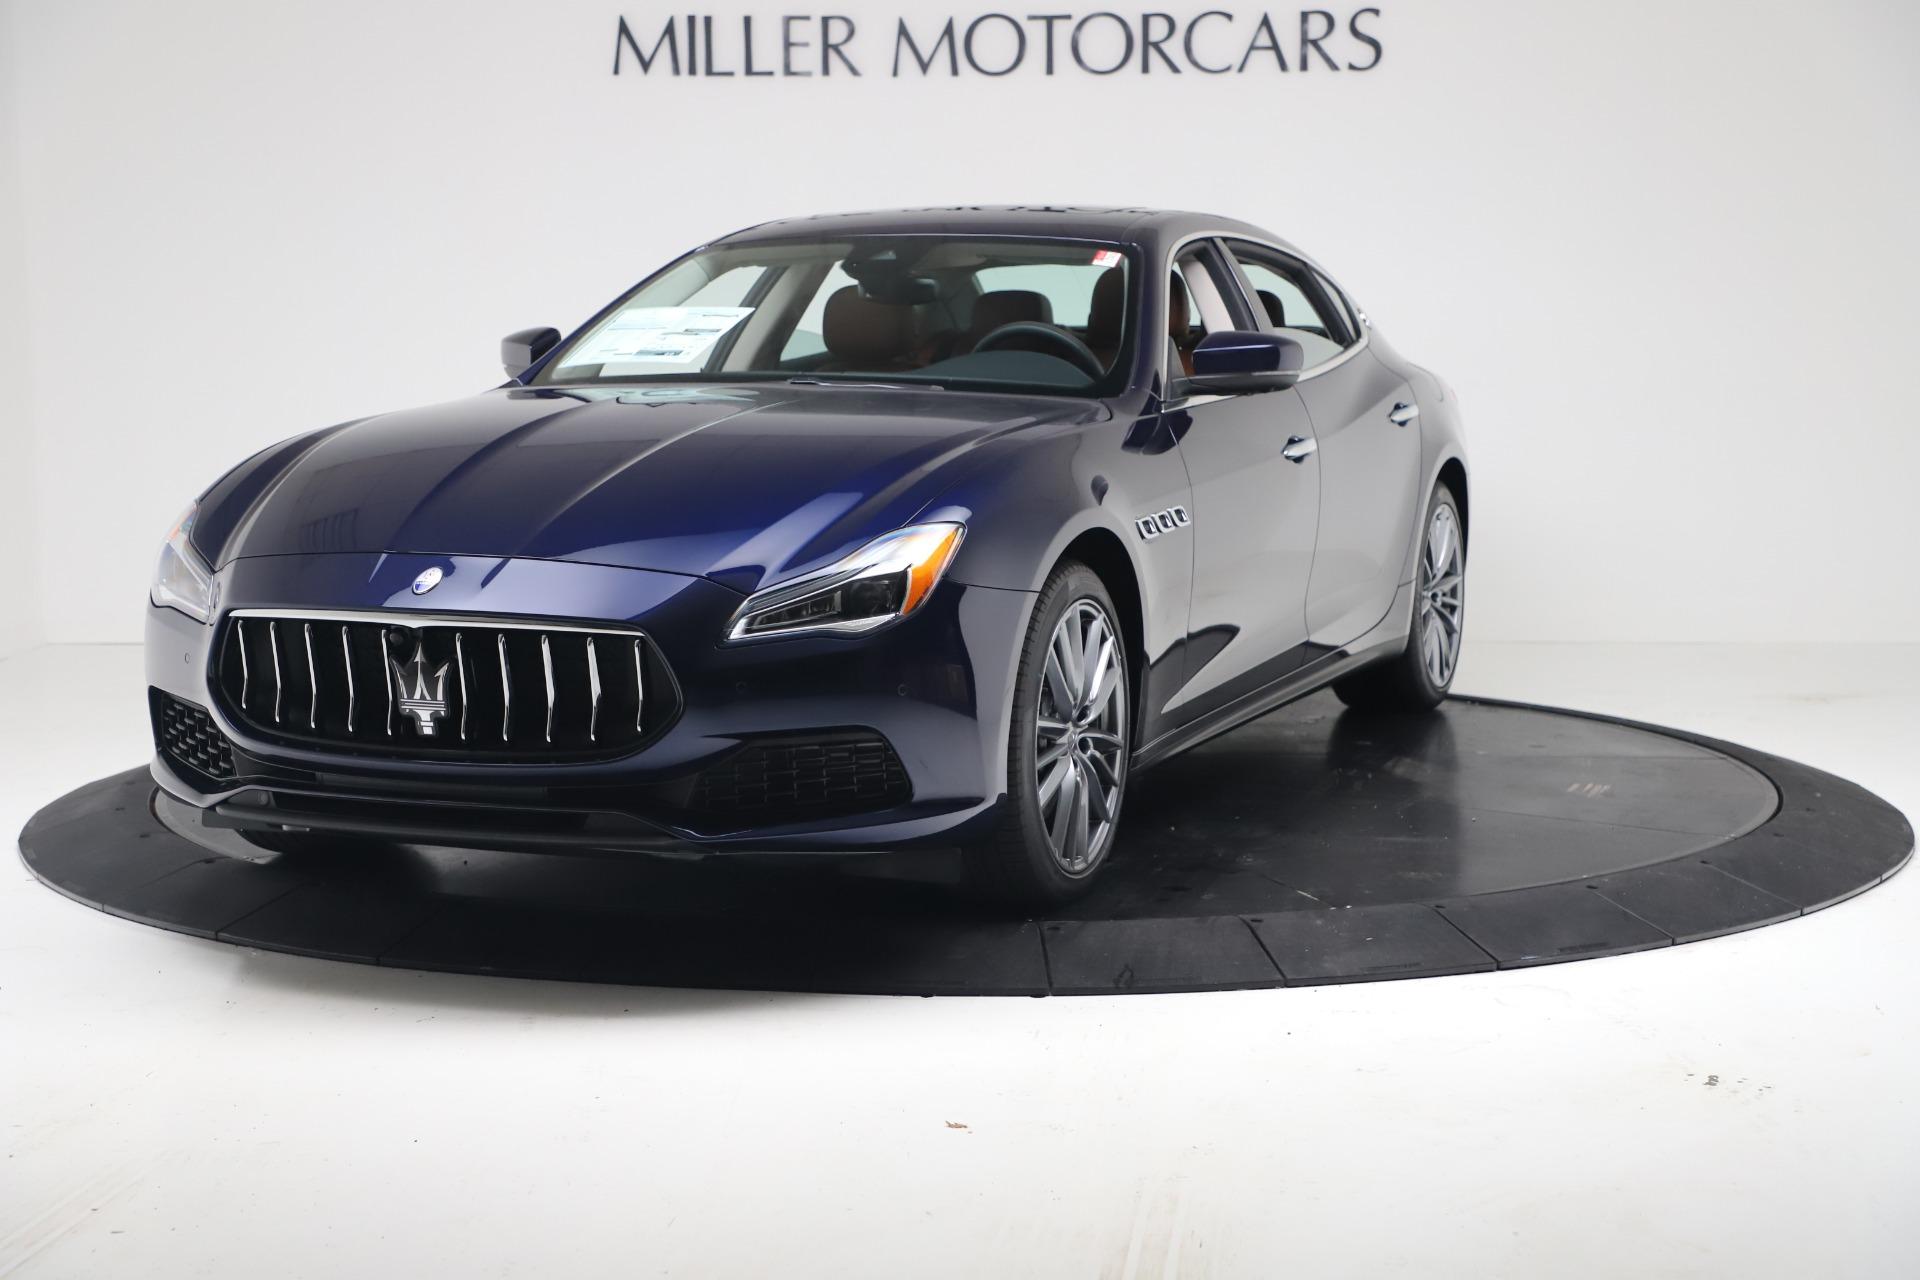 New 2019 Maserati Quattroporte S Q4 for sale Sold at Pagani of Greenwich in Greenwich CT 06830 1